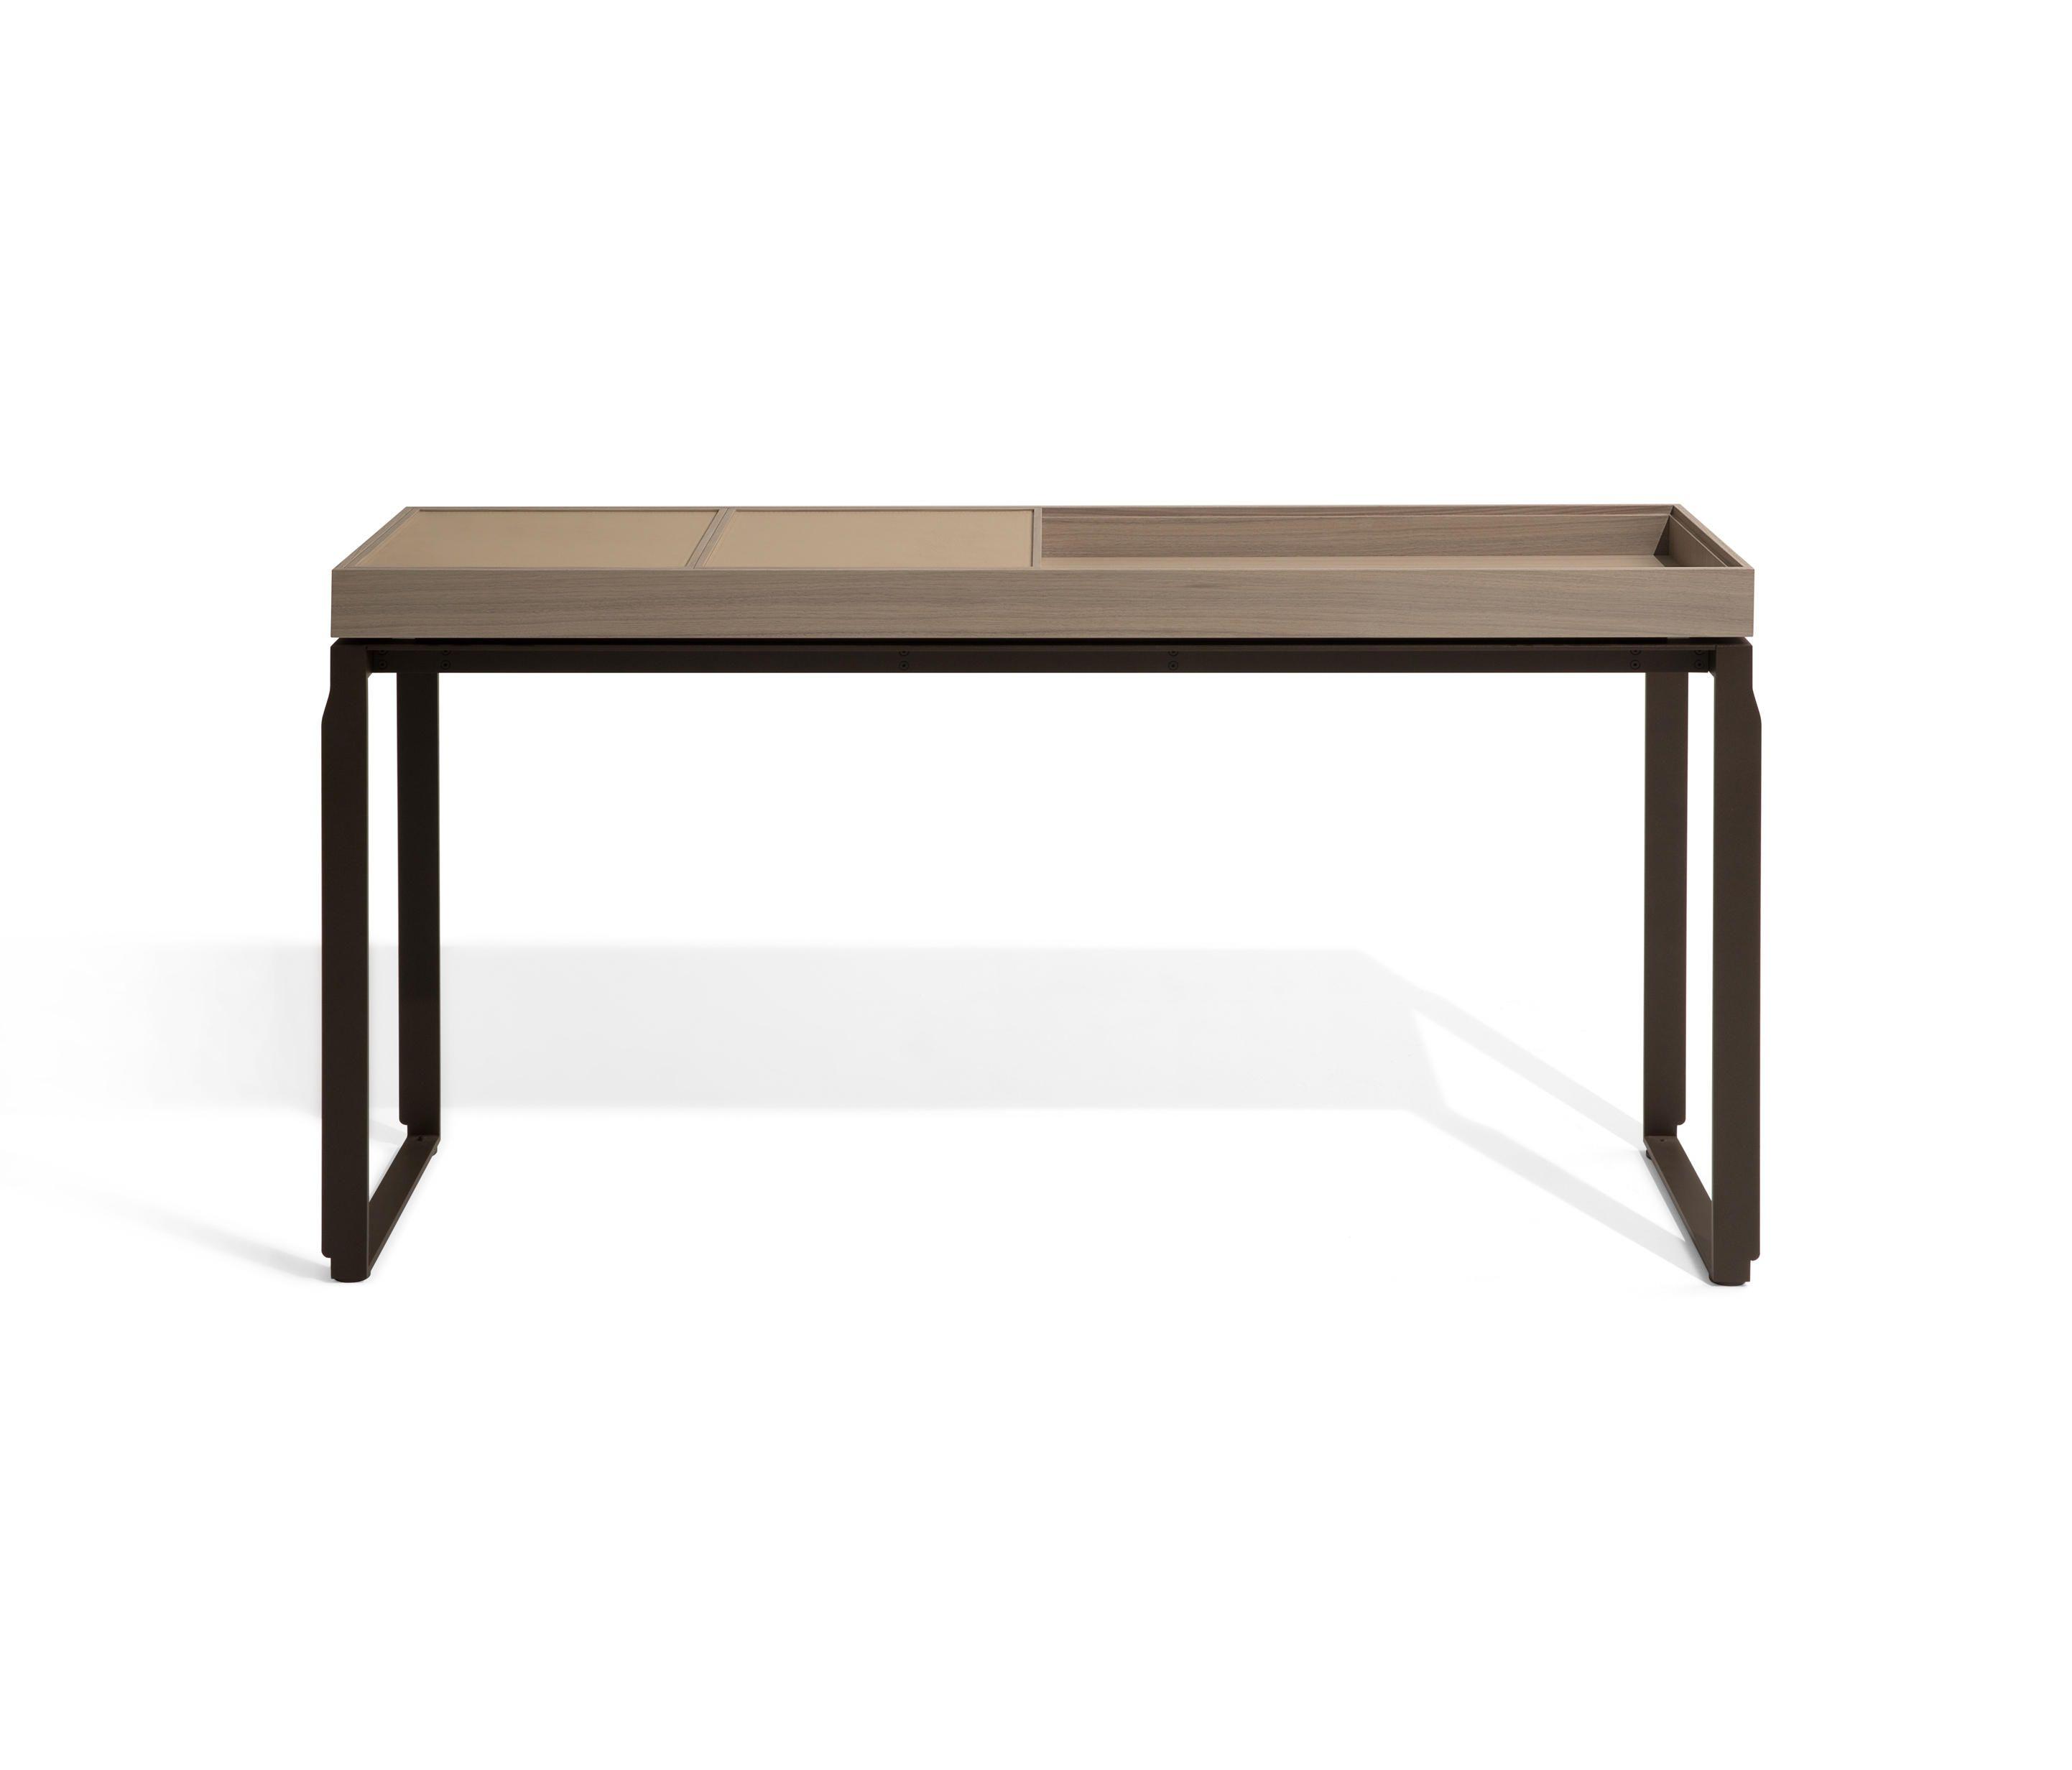 Aei Console by Console tables Designer